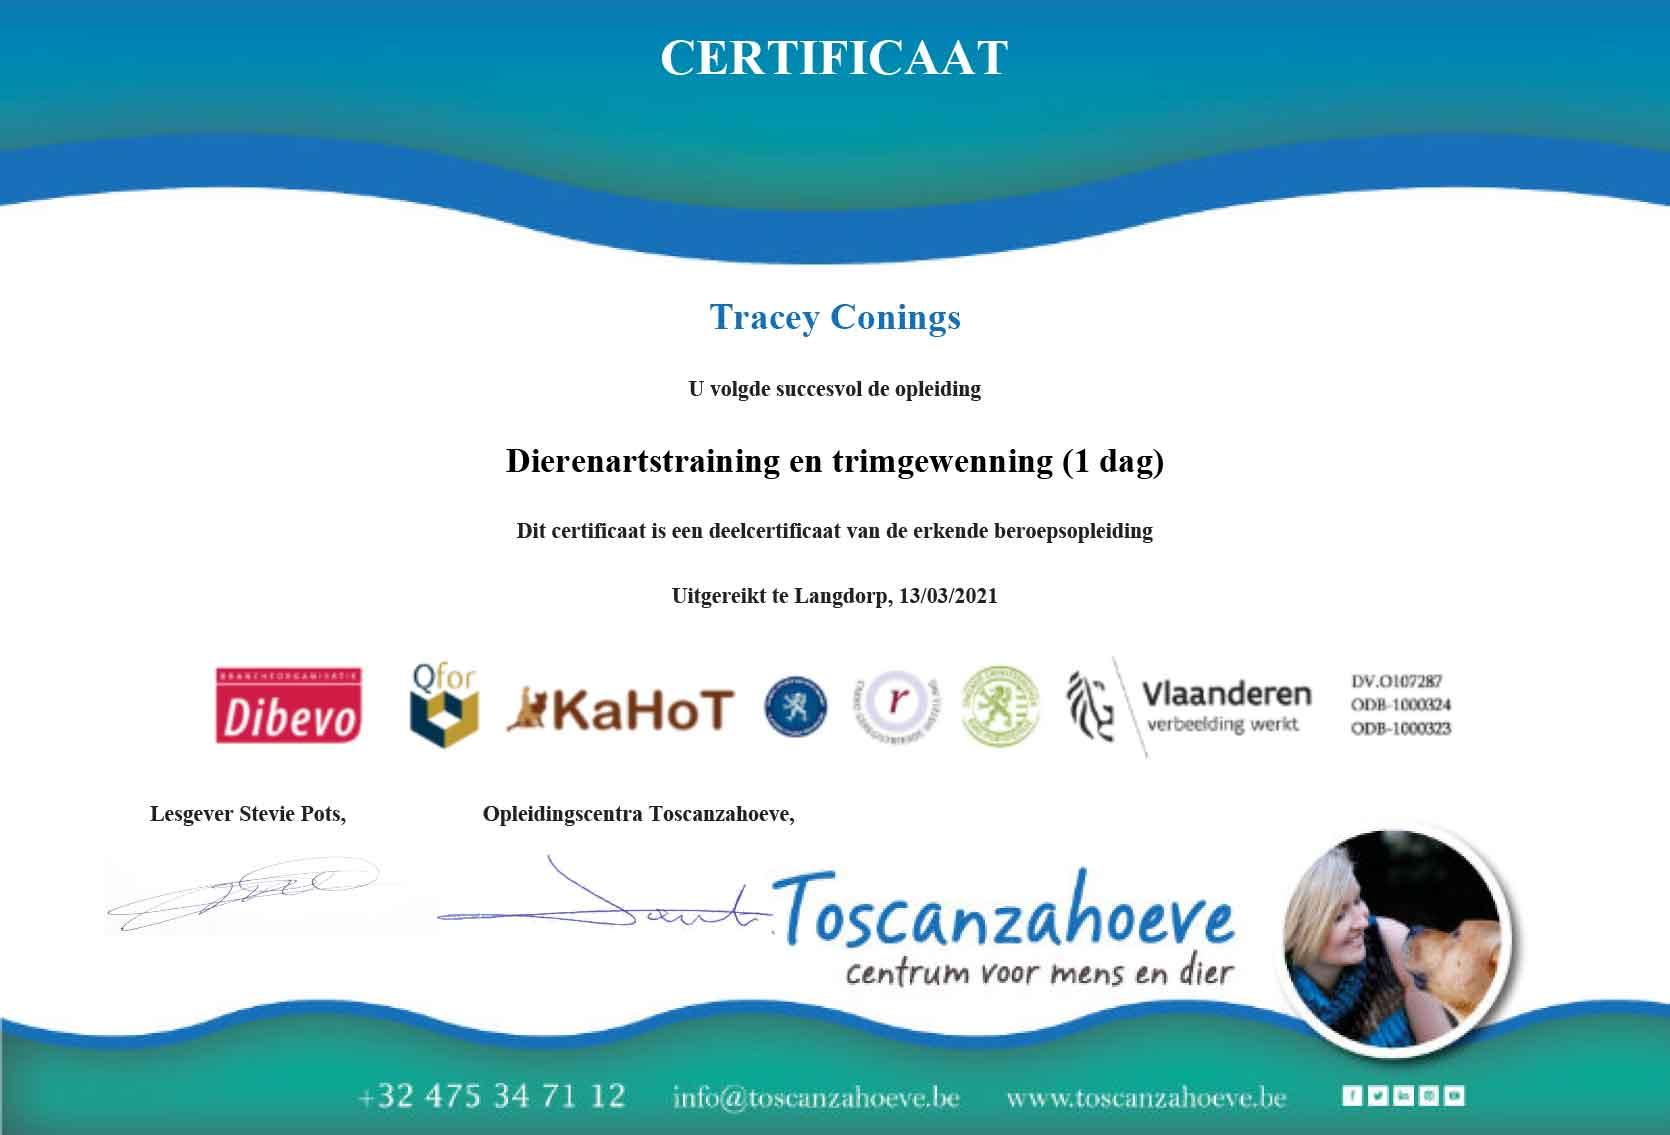 Certificaat Dierenartstraining en trimgewenning Tracey Conings